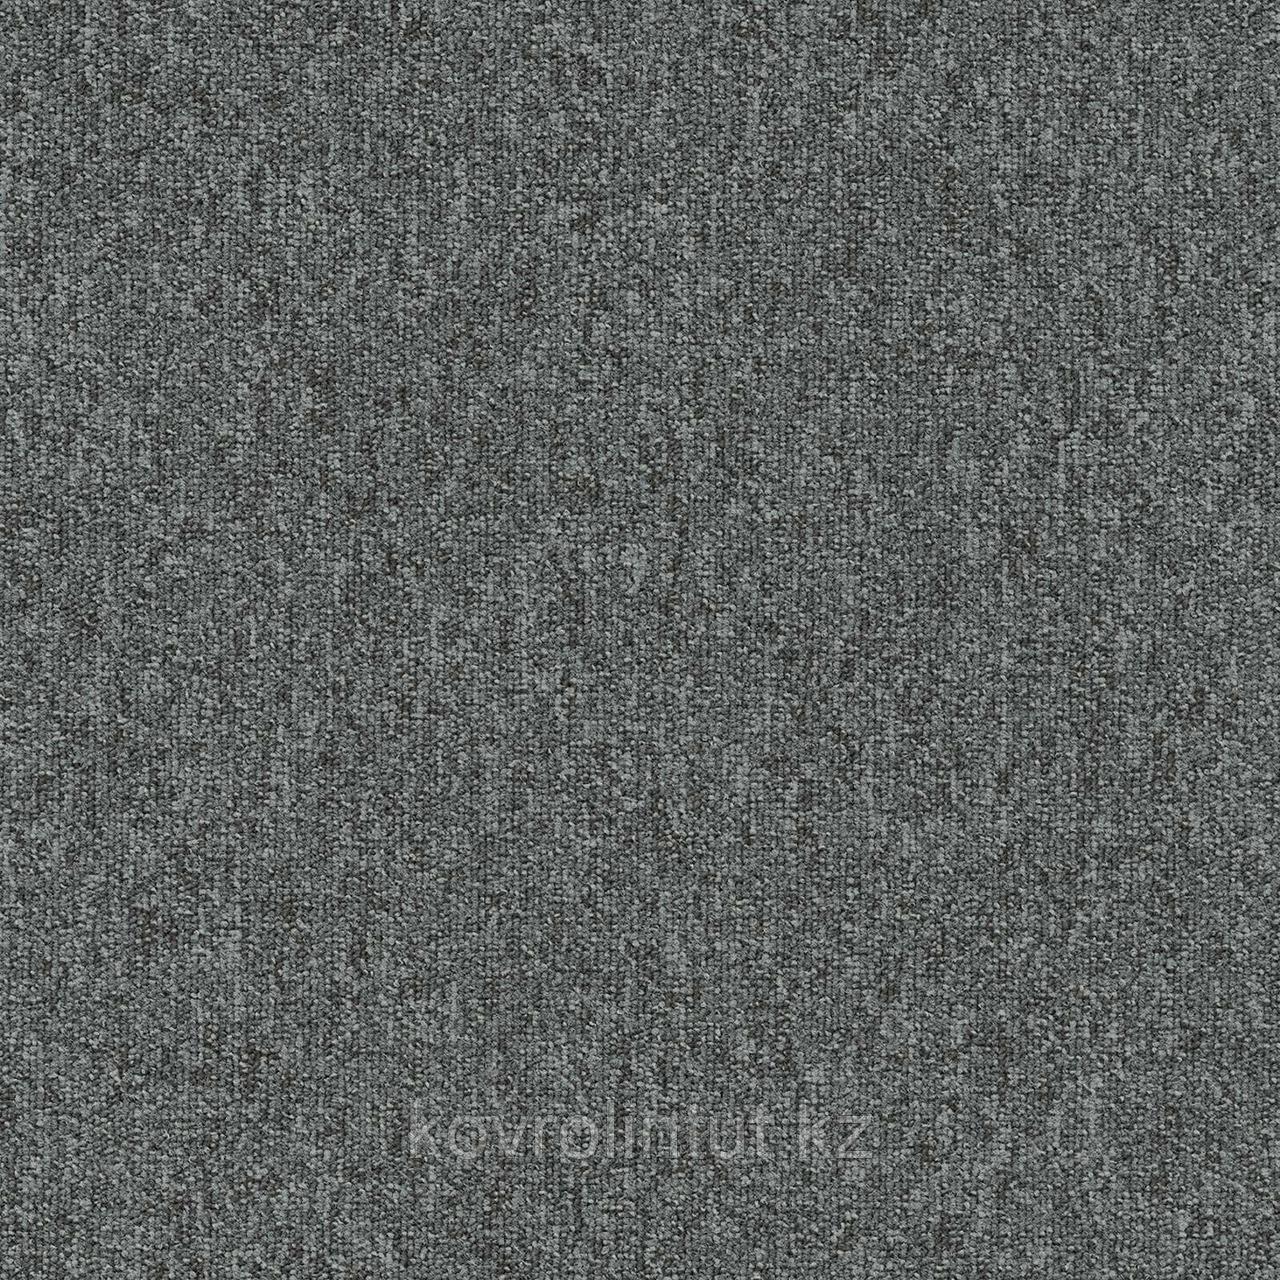 Плитка ковровая Modulyss First 907, 100% PA